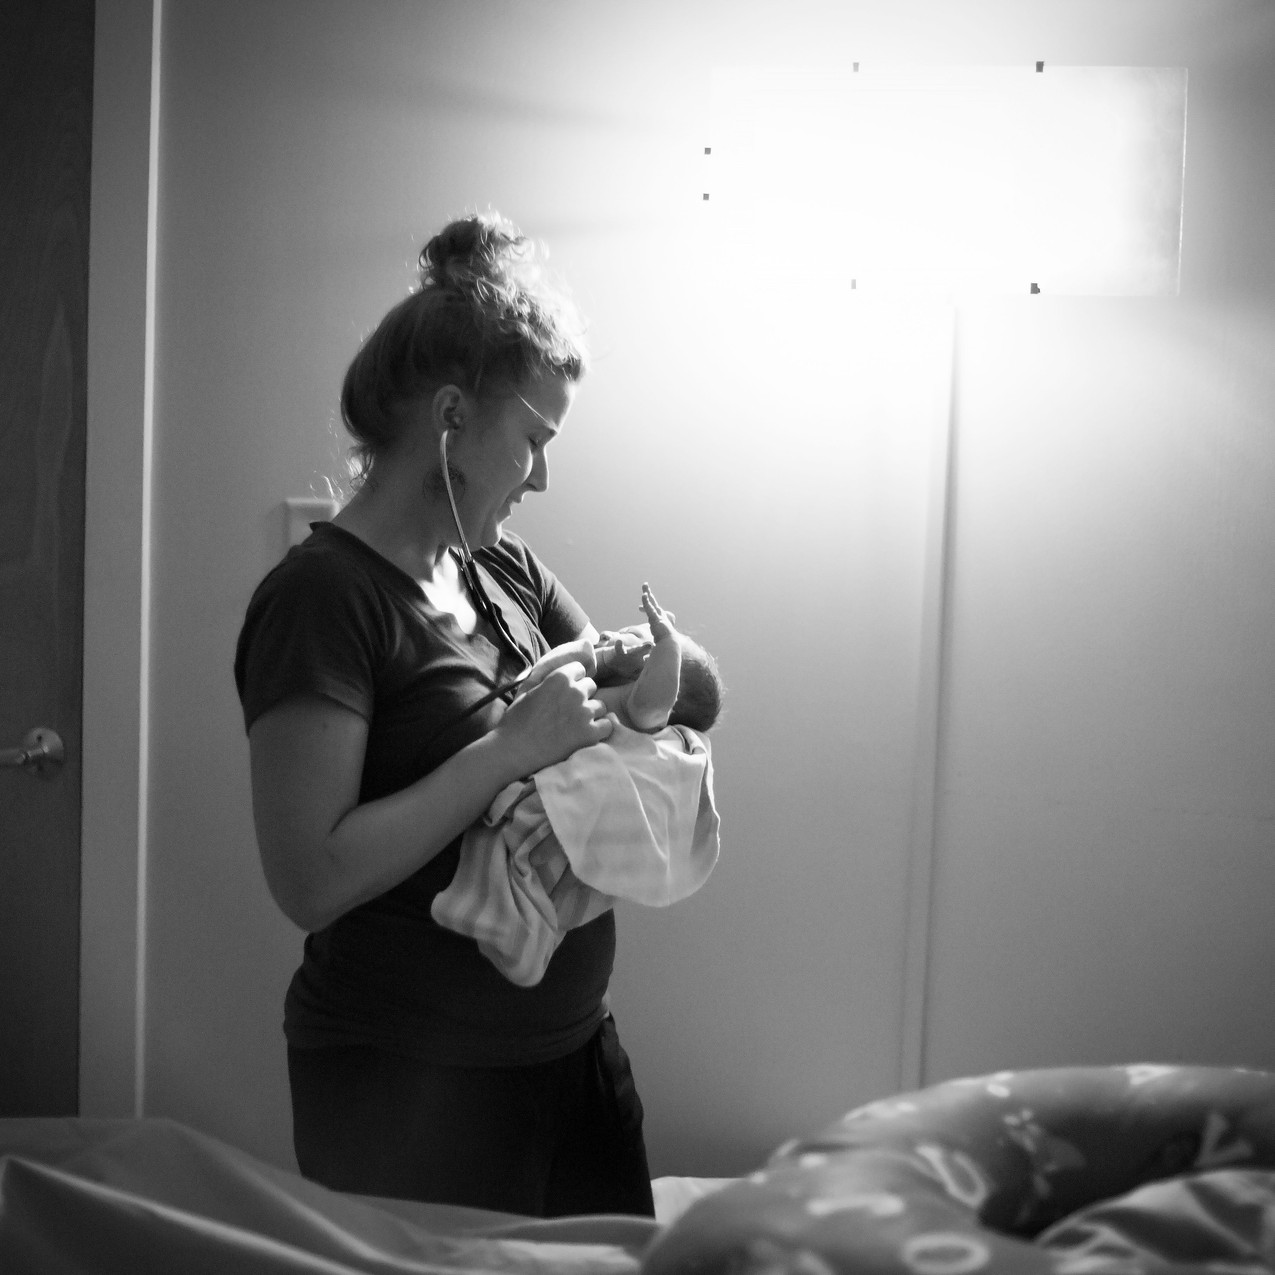 TampaBirthPhotographerLaborOfLoveBirthCenterLaborofLovebirthcenterTampaTampa Birth Photographer Tampa newborn Photographer in water birth Labor of love Lutz Fl_Jan252017_0283 copy